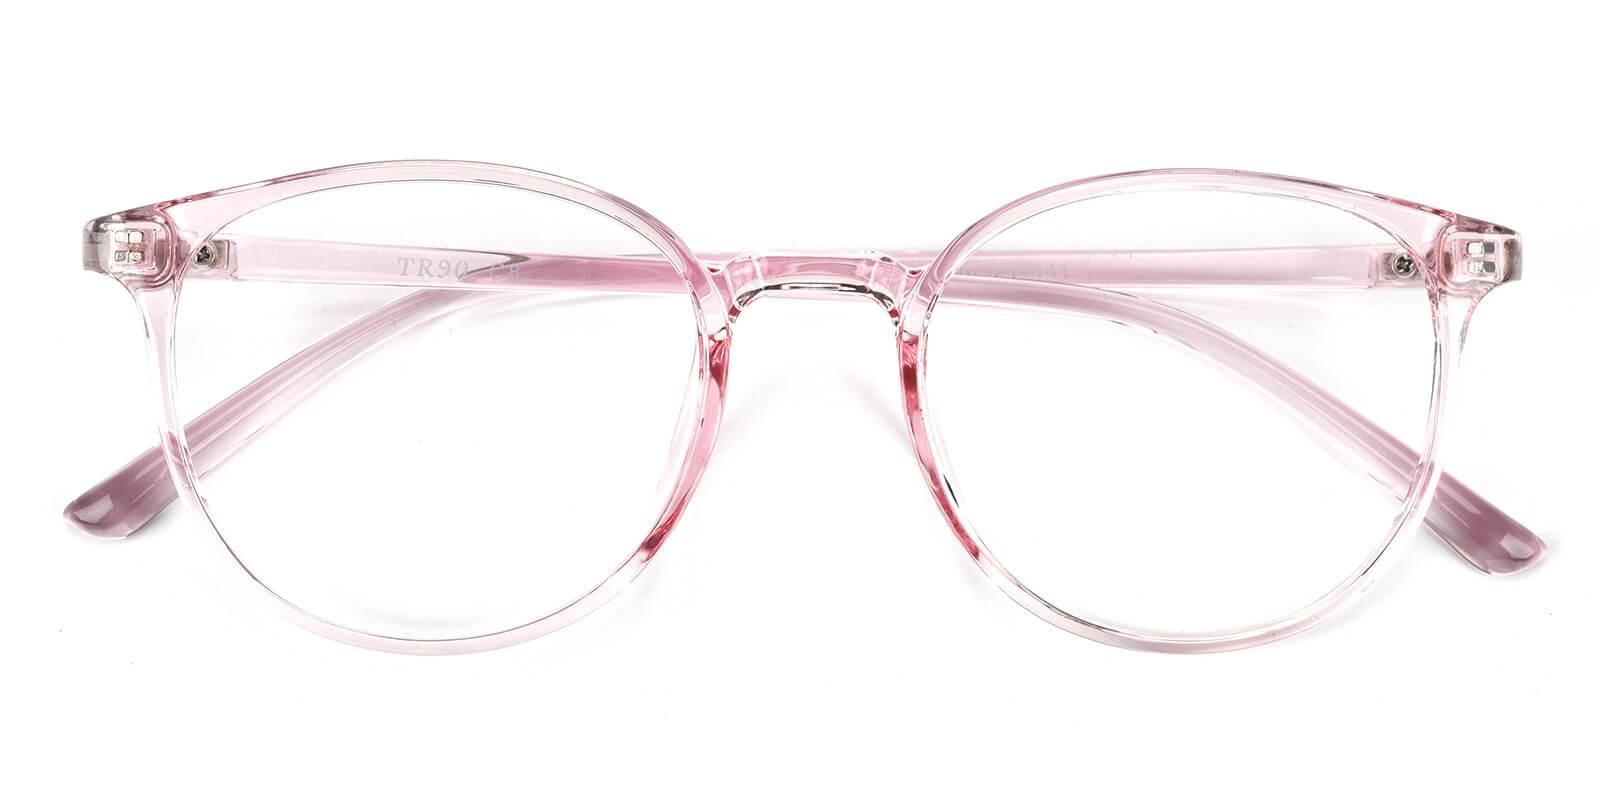 Aure-Pink-Round-TR-Eyeglasses-detail